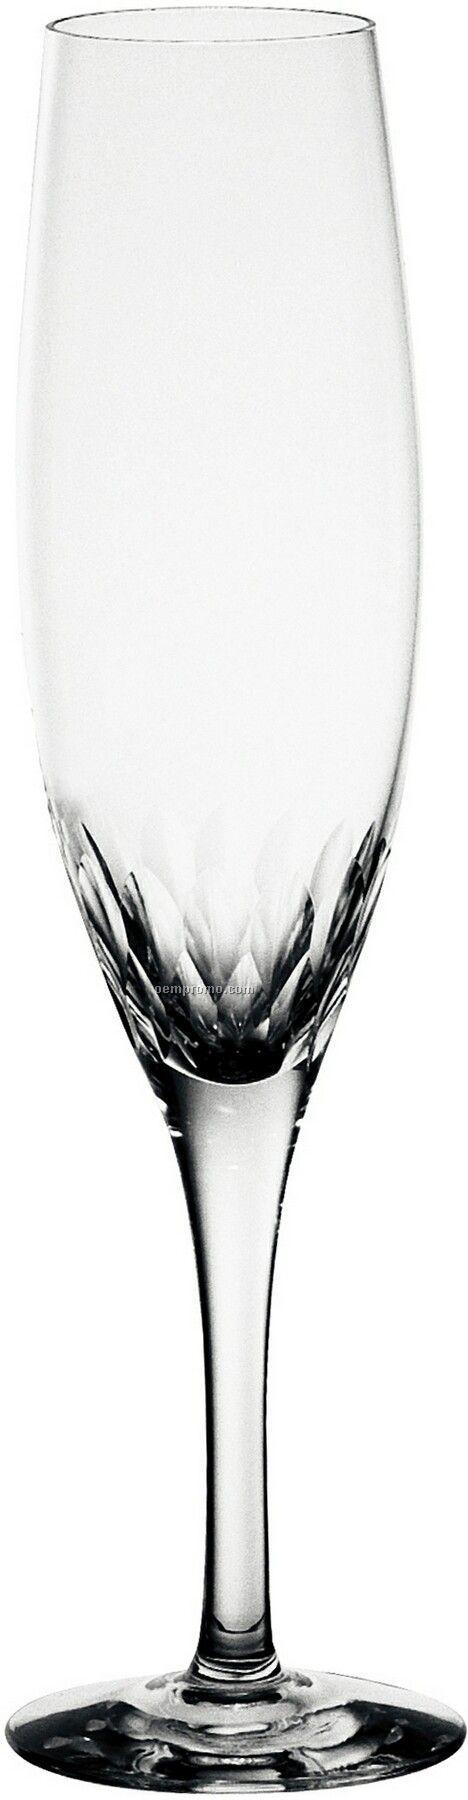 Prelude Crystal Champagne Flute Glass W/ Leaf Pattern